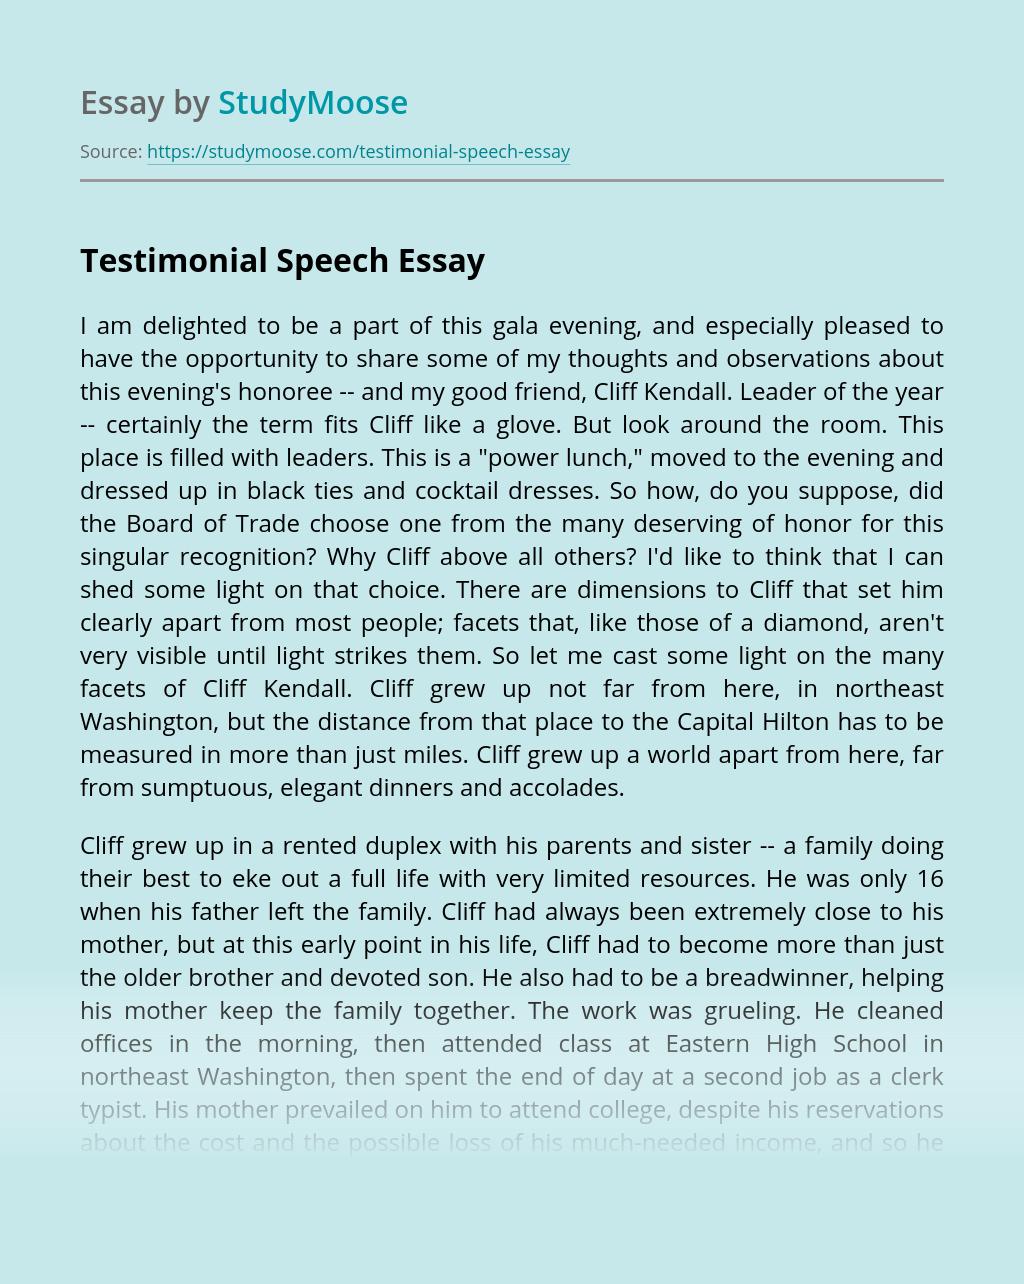 Testimonial Speech